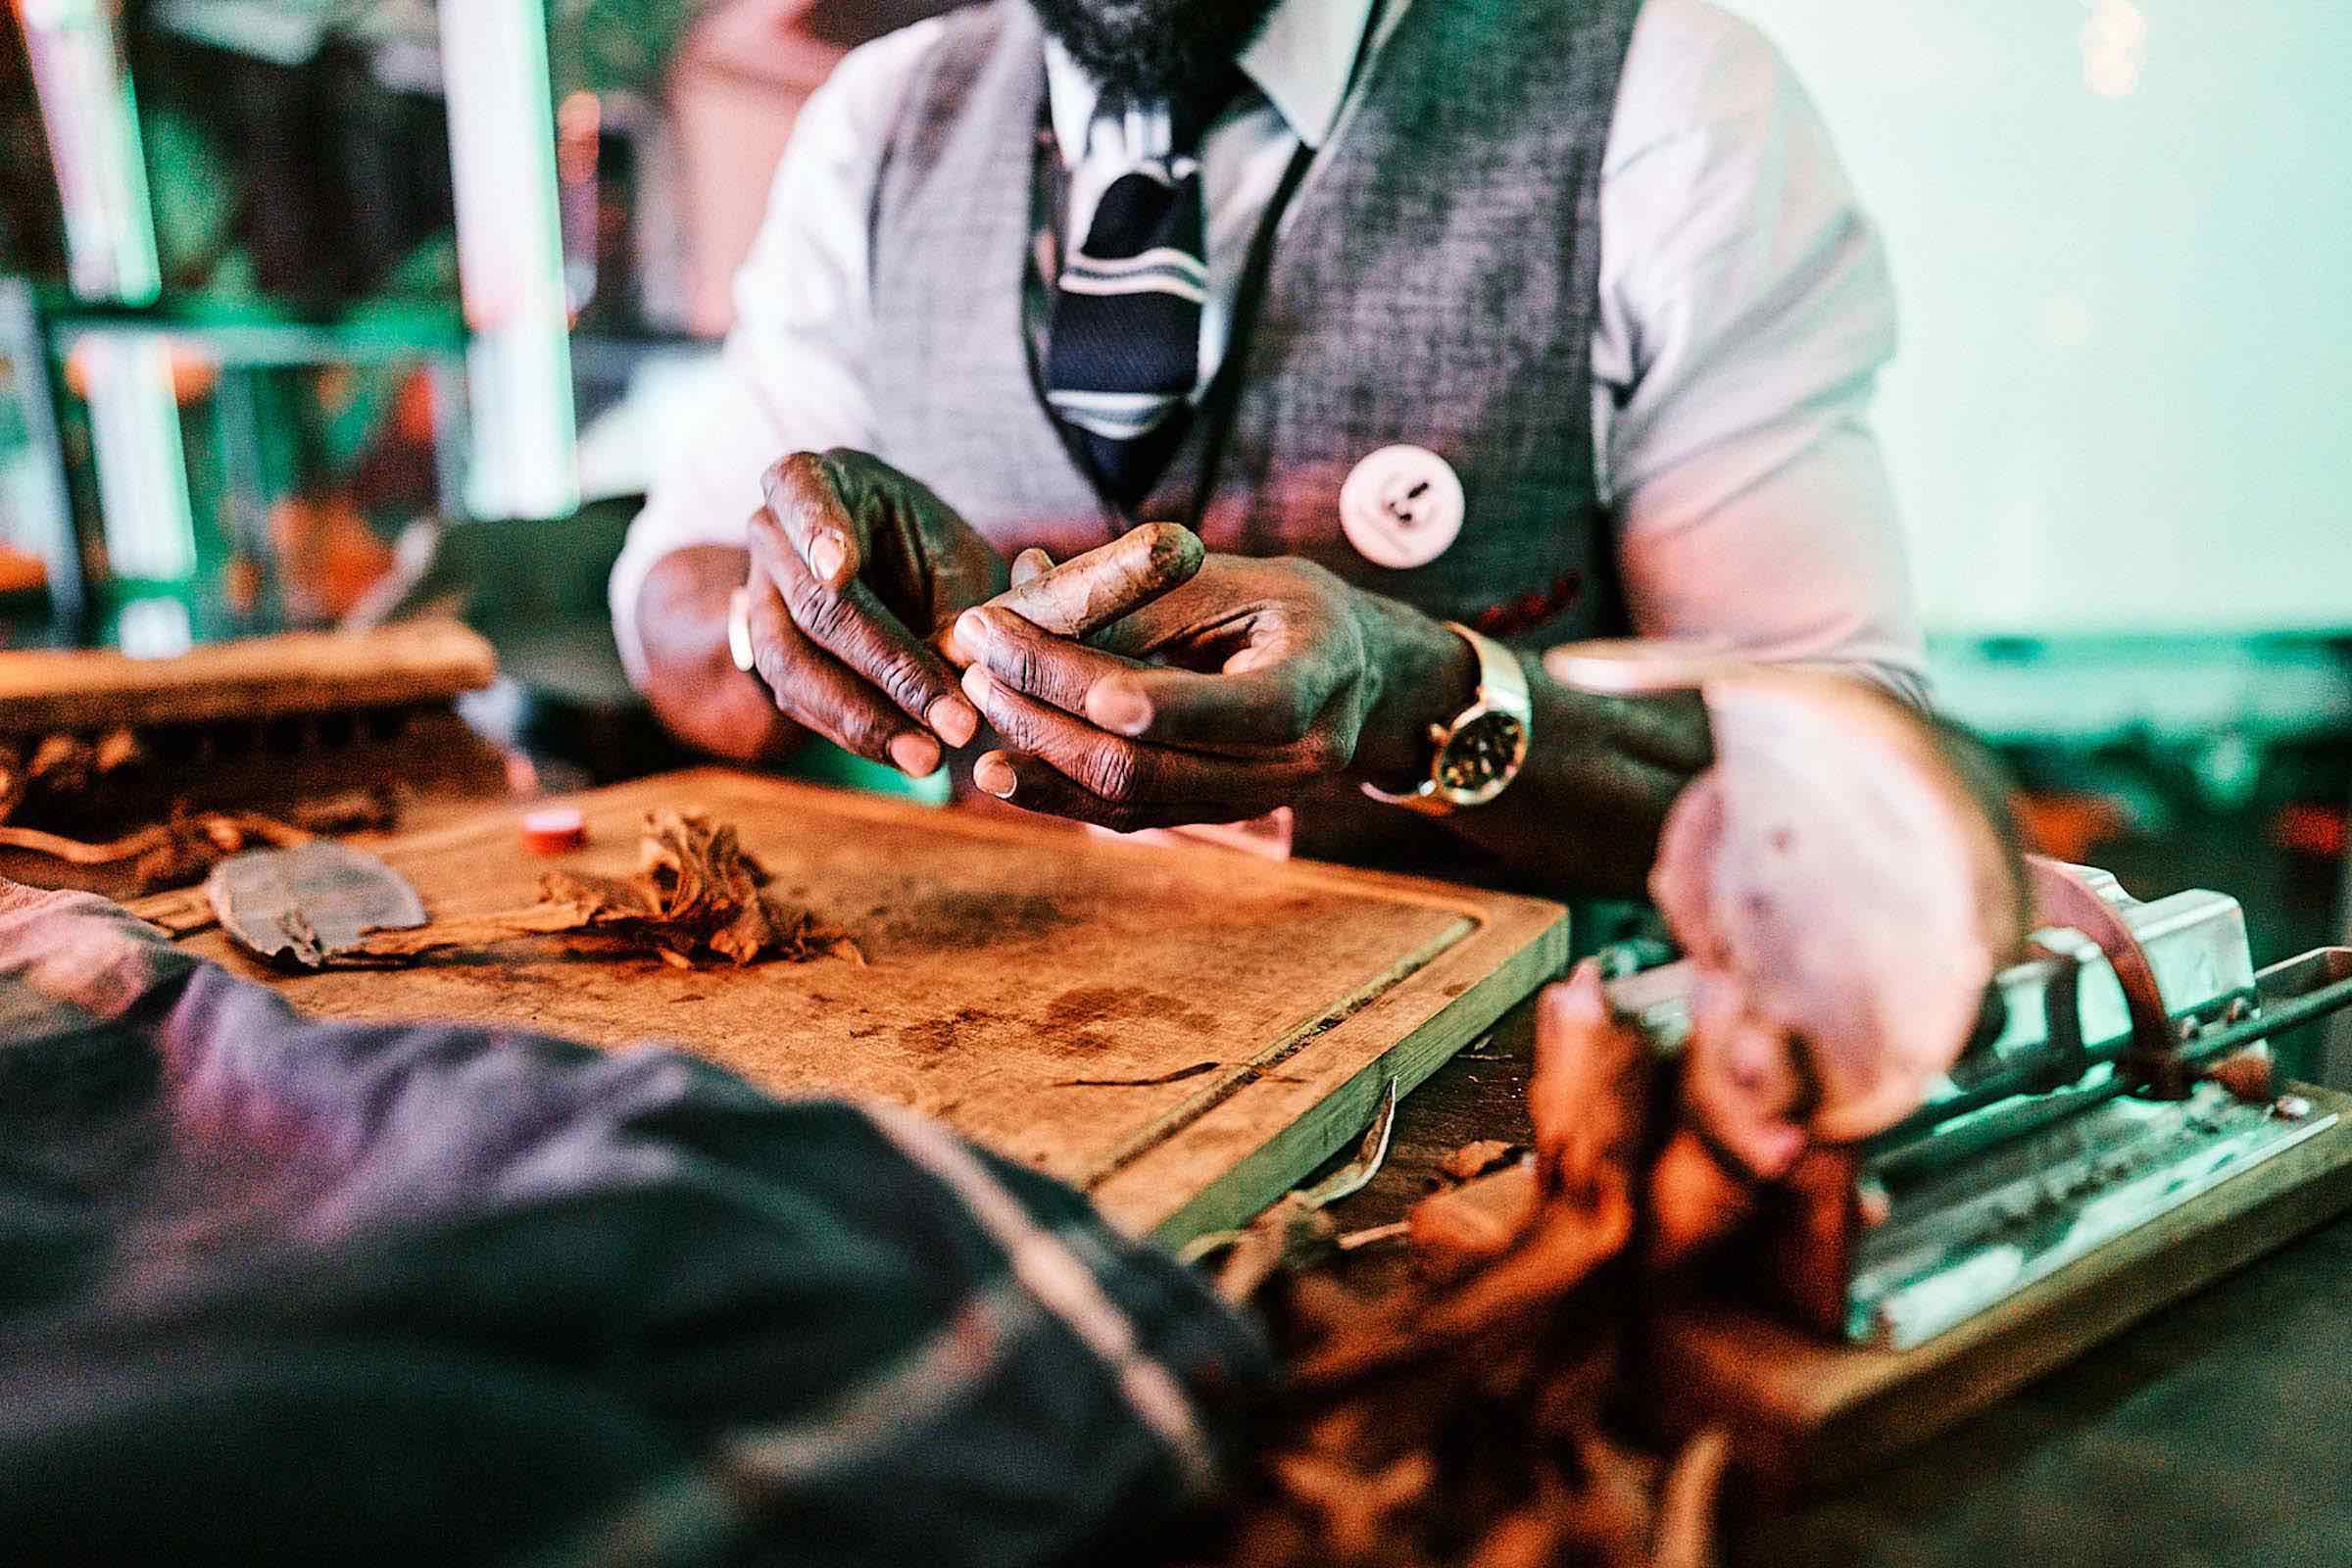 Zigarrendreher | Hamburg | Zigarren | Drehen | Zigarrenroller | Zigarrenrollerin | Zigarrendreherin | Mieten | Anfragen | Trocadero | Zigarren | Handgemacht | Robusto | Corona | Torpedo | Churchill | Longfiller | Tabak | Cuba